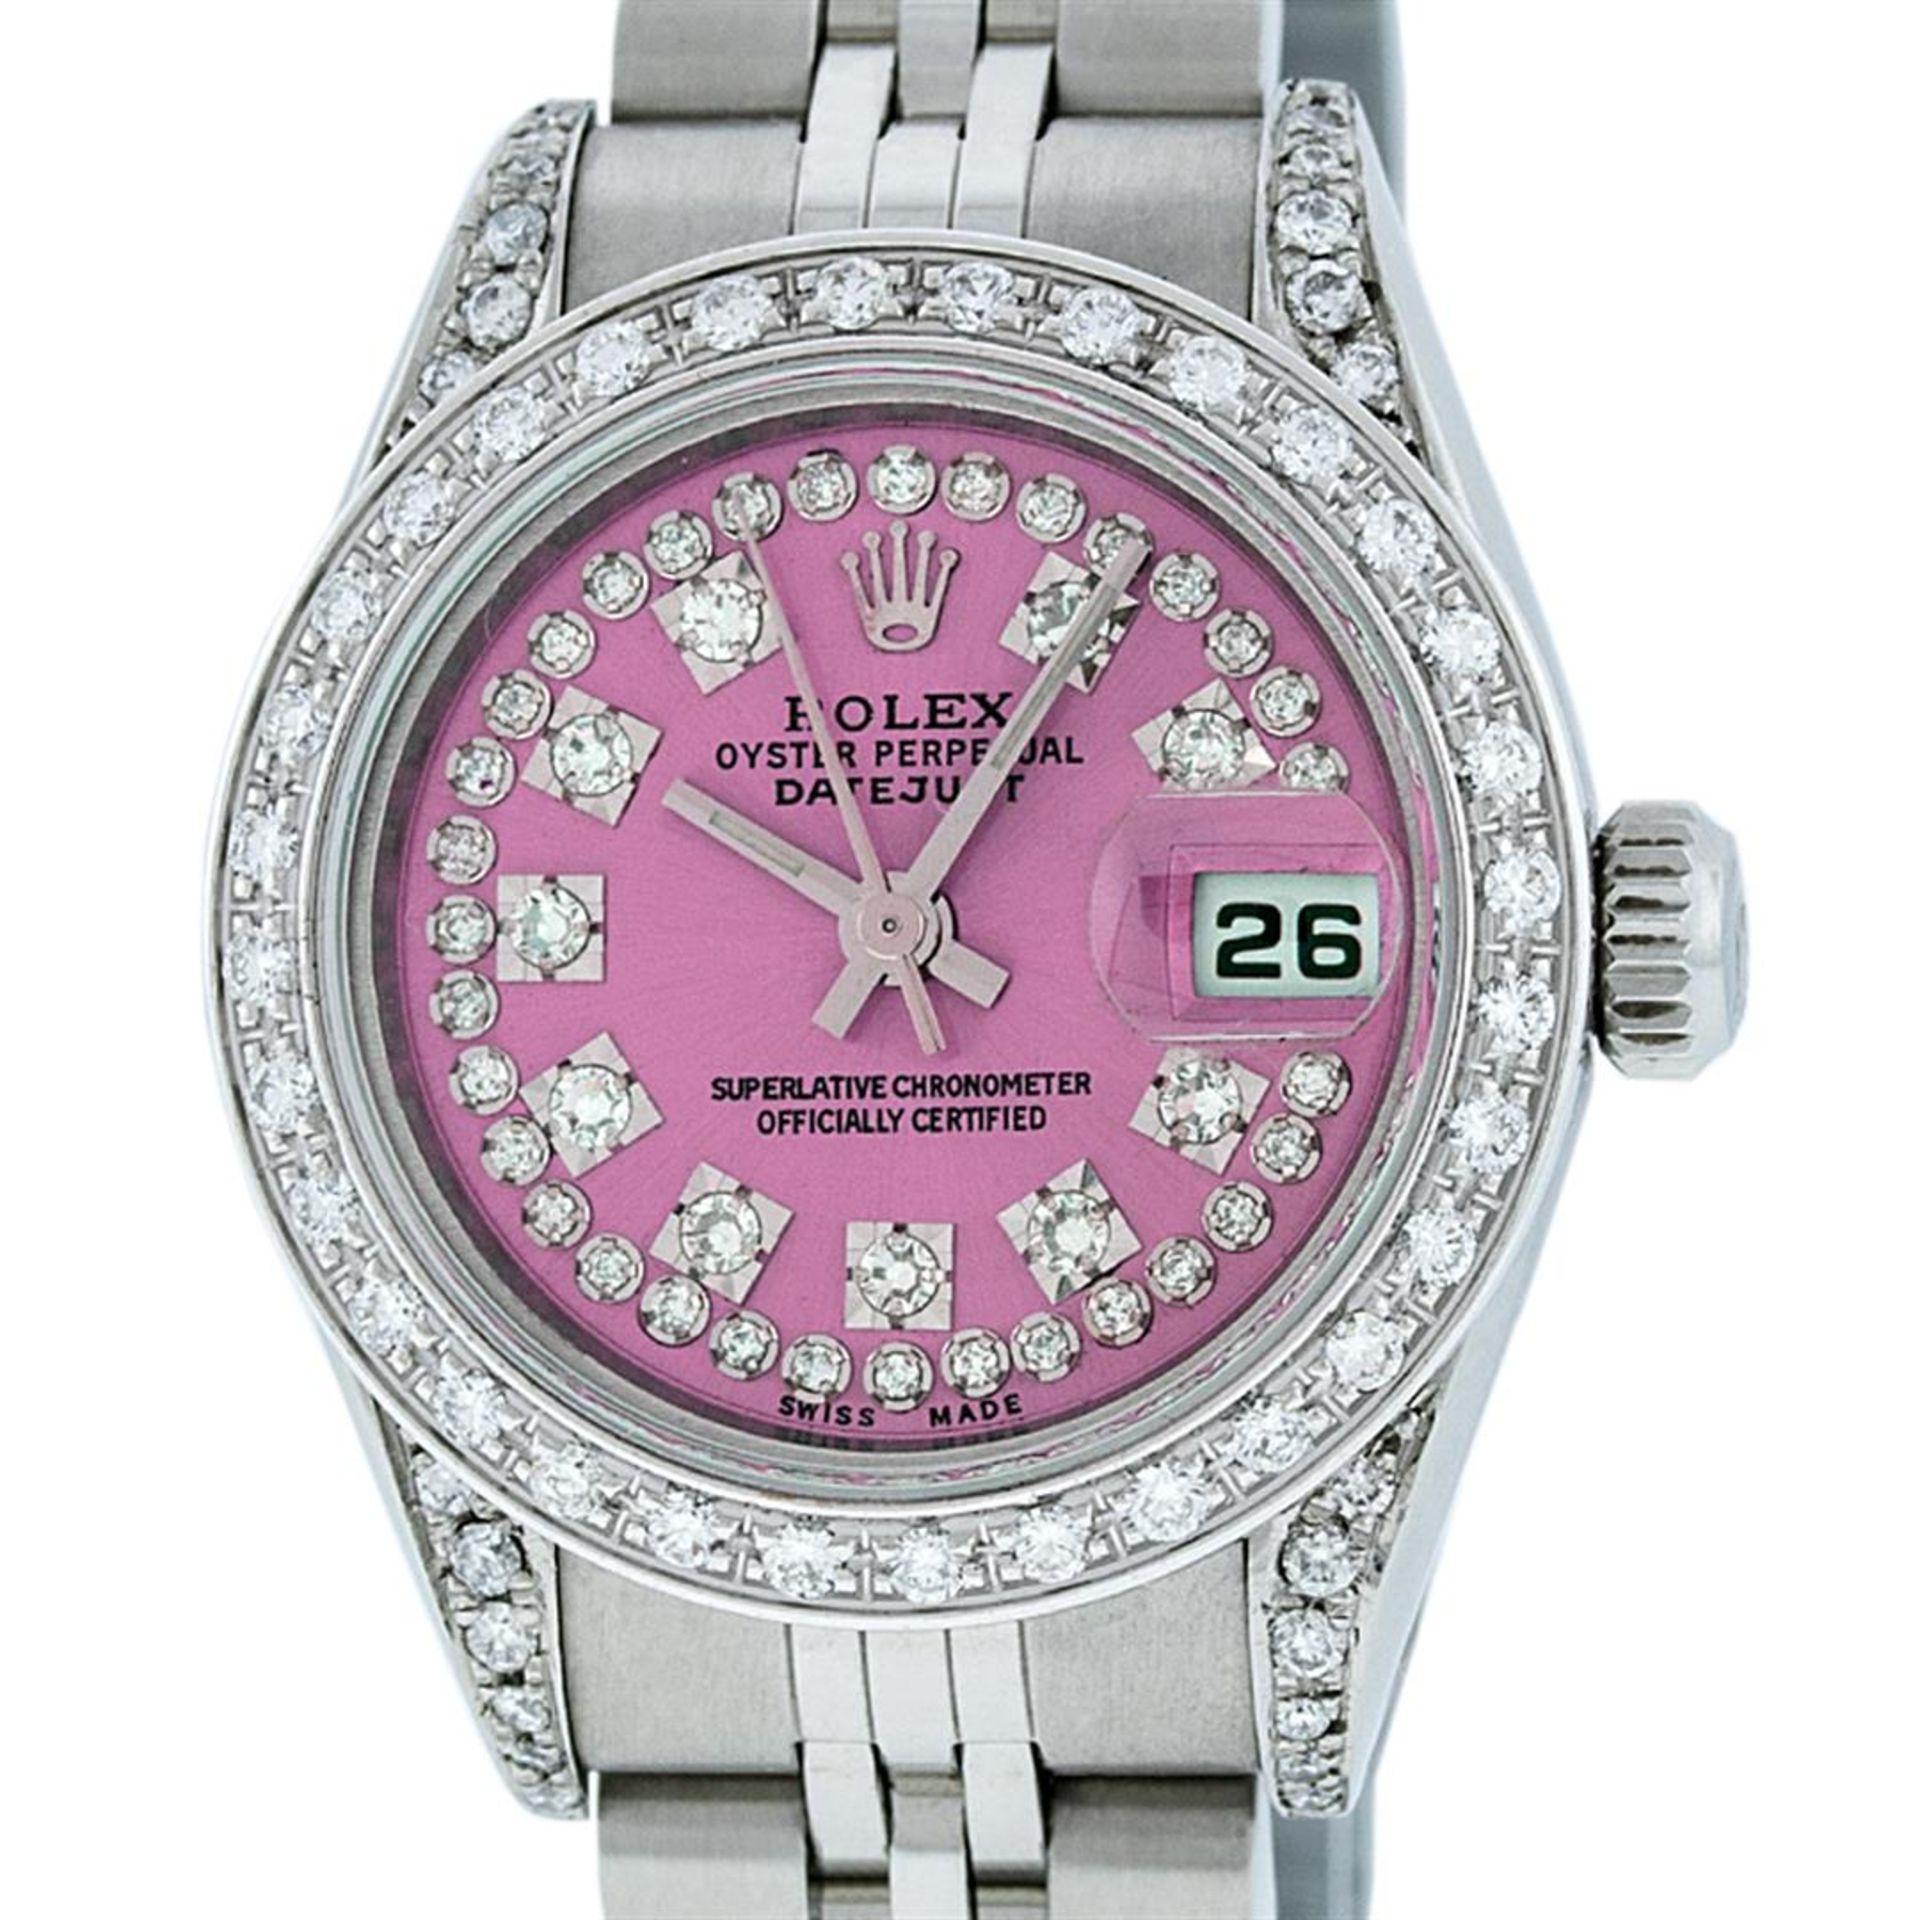 Rolex Ladies Stainless Steel Quickset Pink String Diamond Lugs Datejust Wristwat - Image 5 of 9